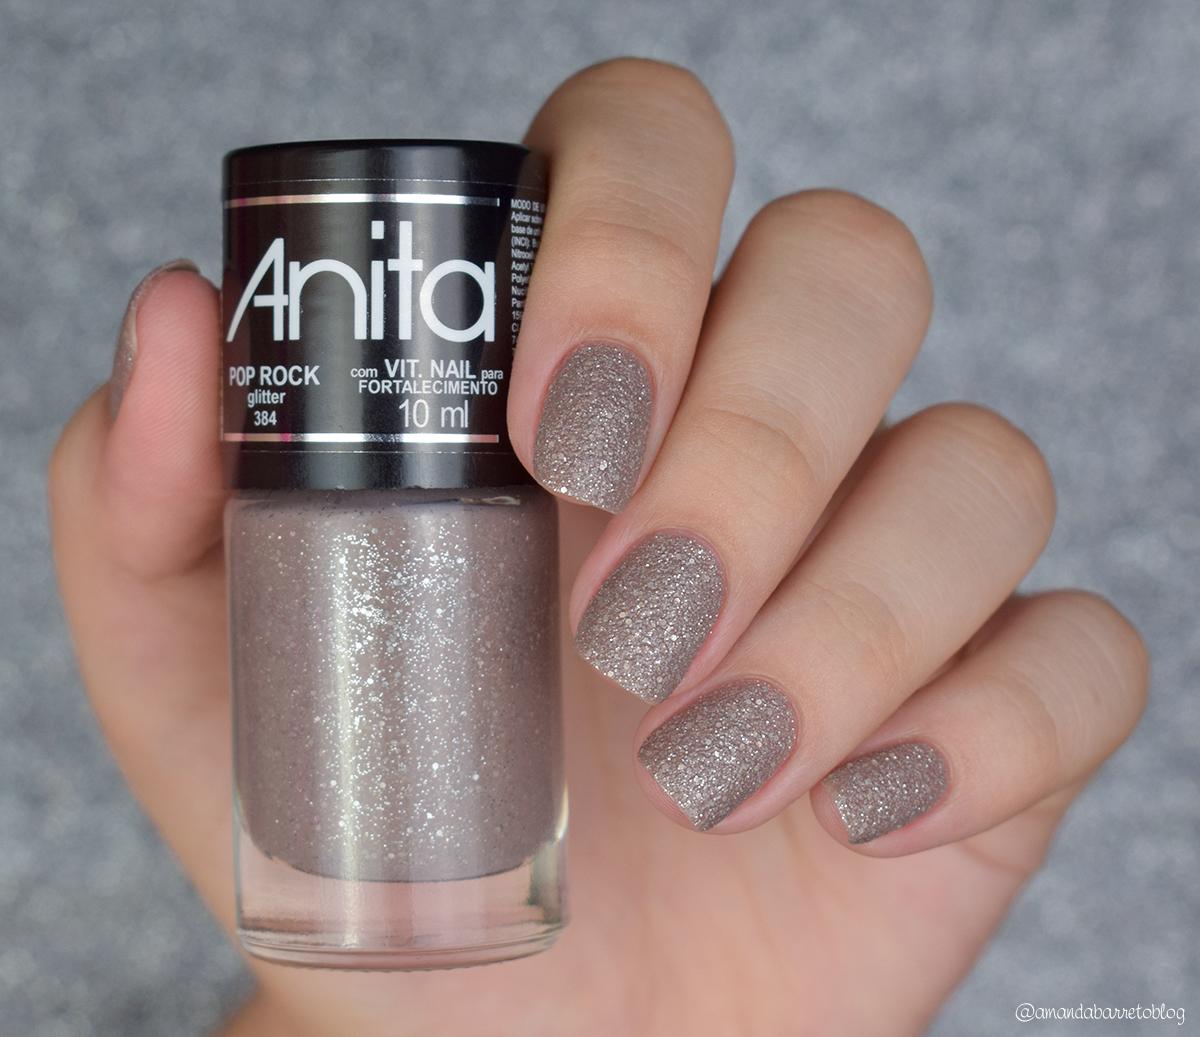 Esmalte Anita - Pop Rock